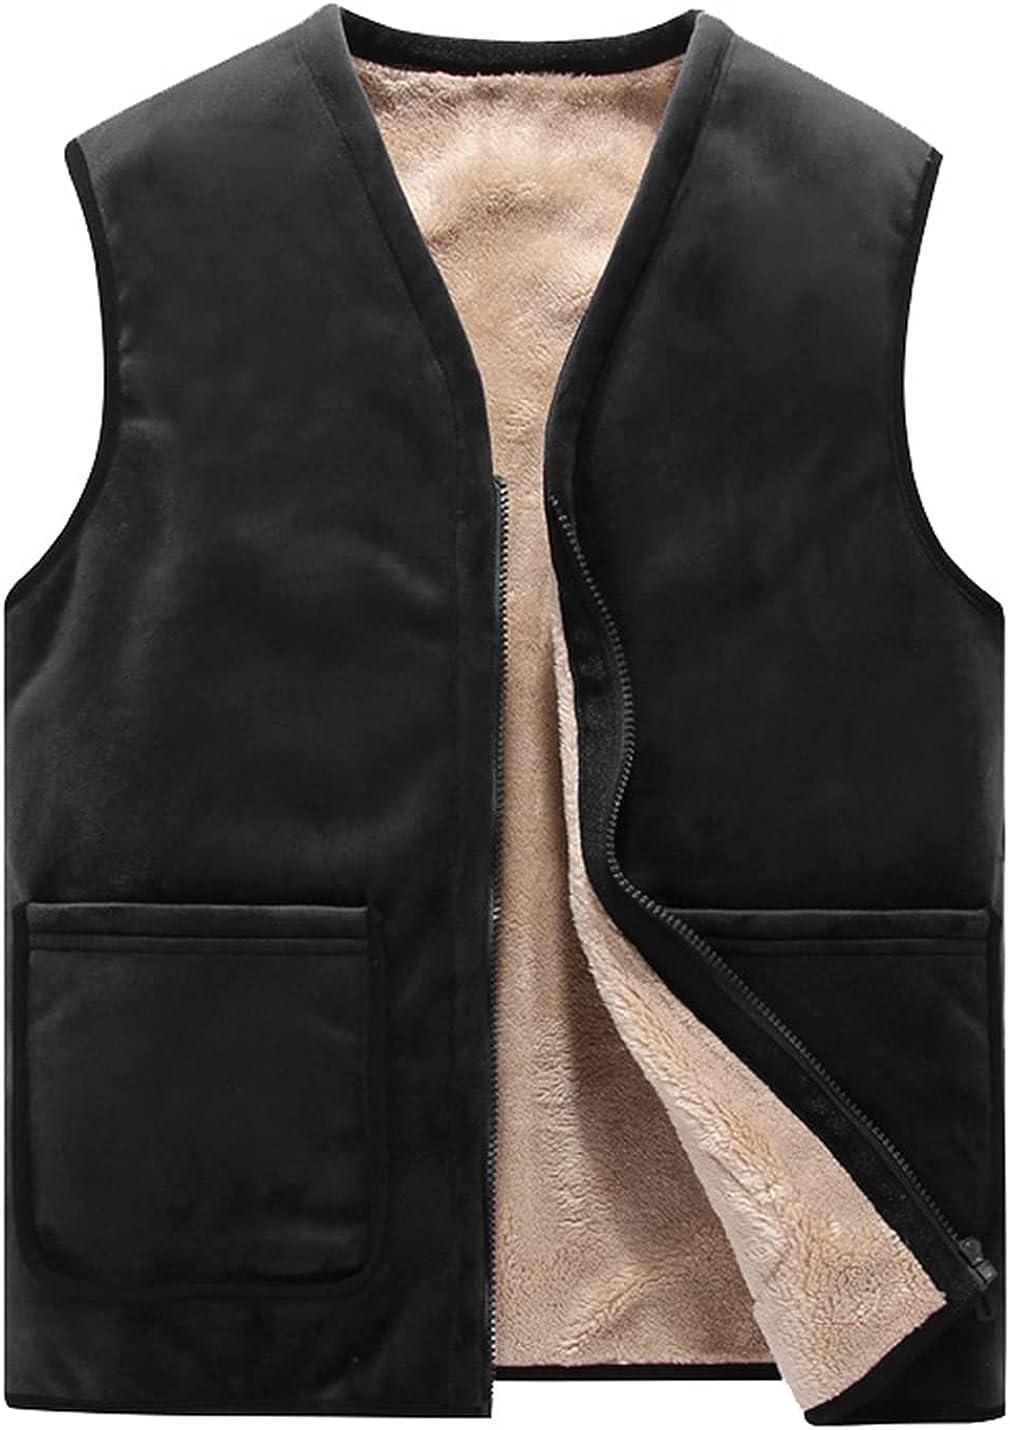 Kissonic Men's Winter Warm V-Neck Zip Fleece Vest Sherpa Lined Sleeveless Jacket Waistcoat